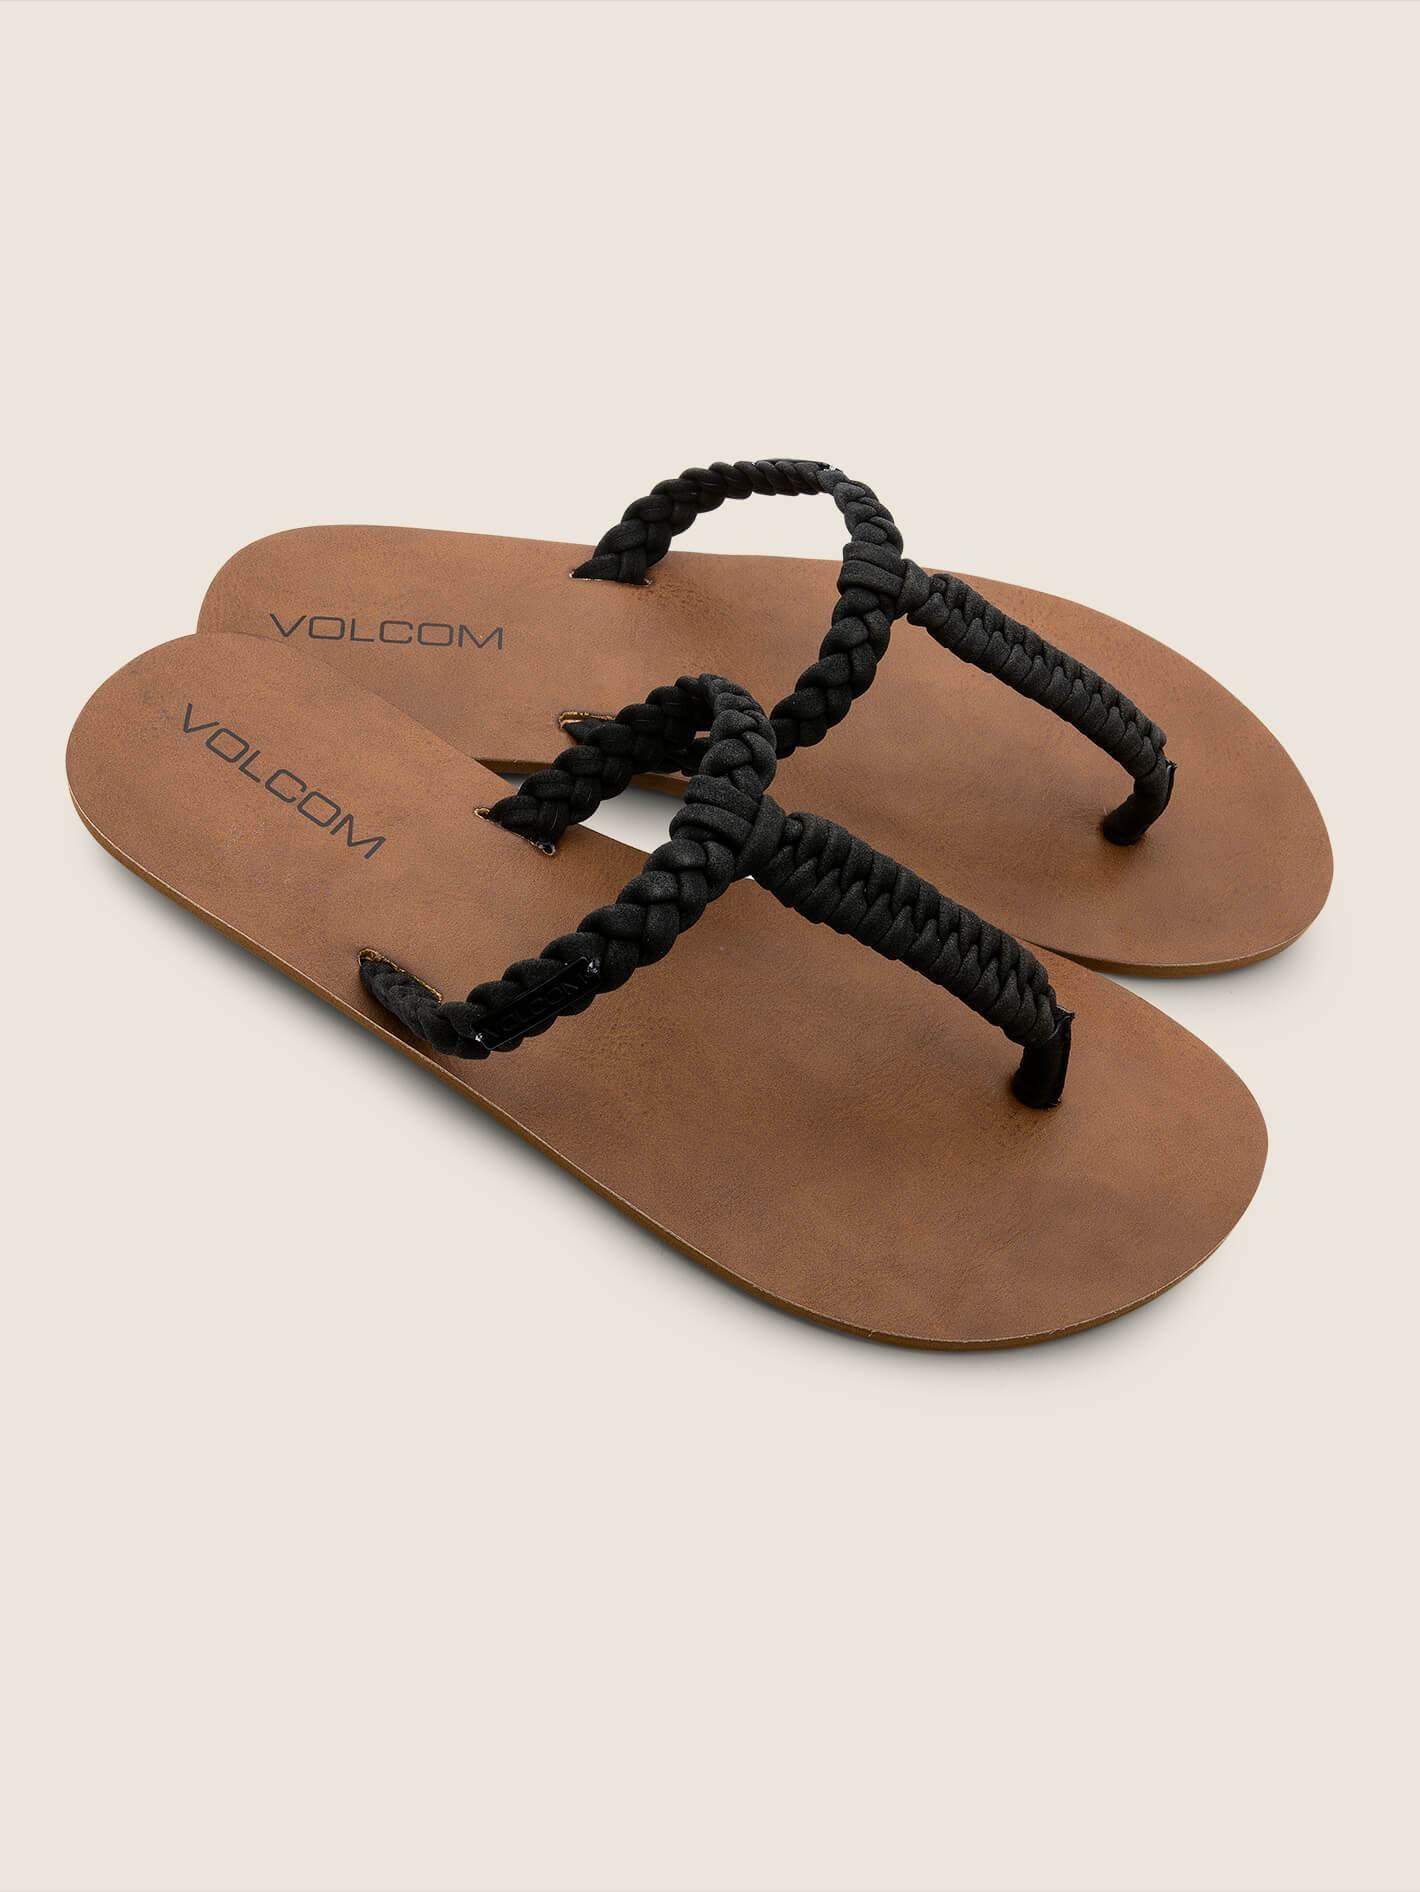 Fishtail Sandals - BLACK / 8